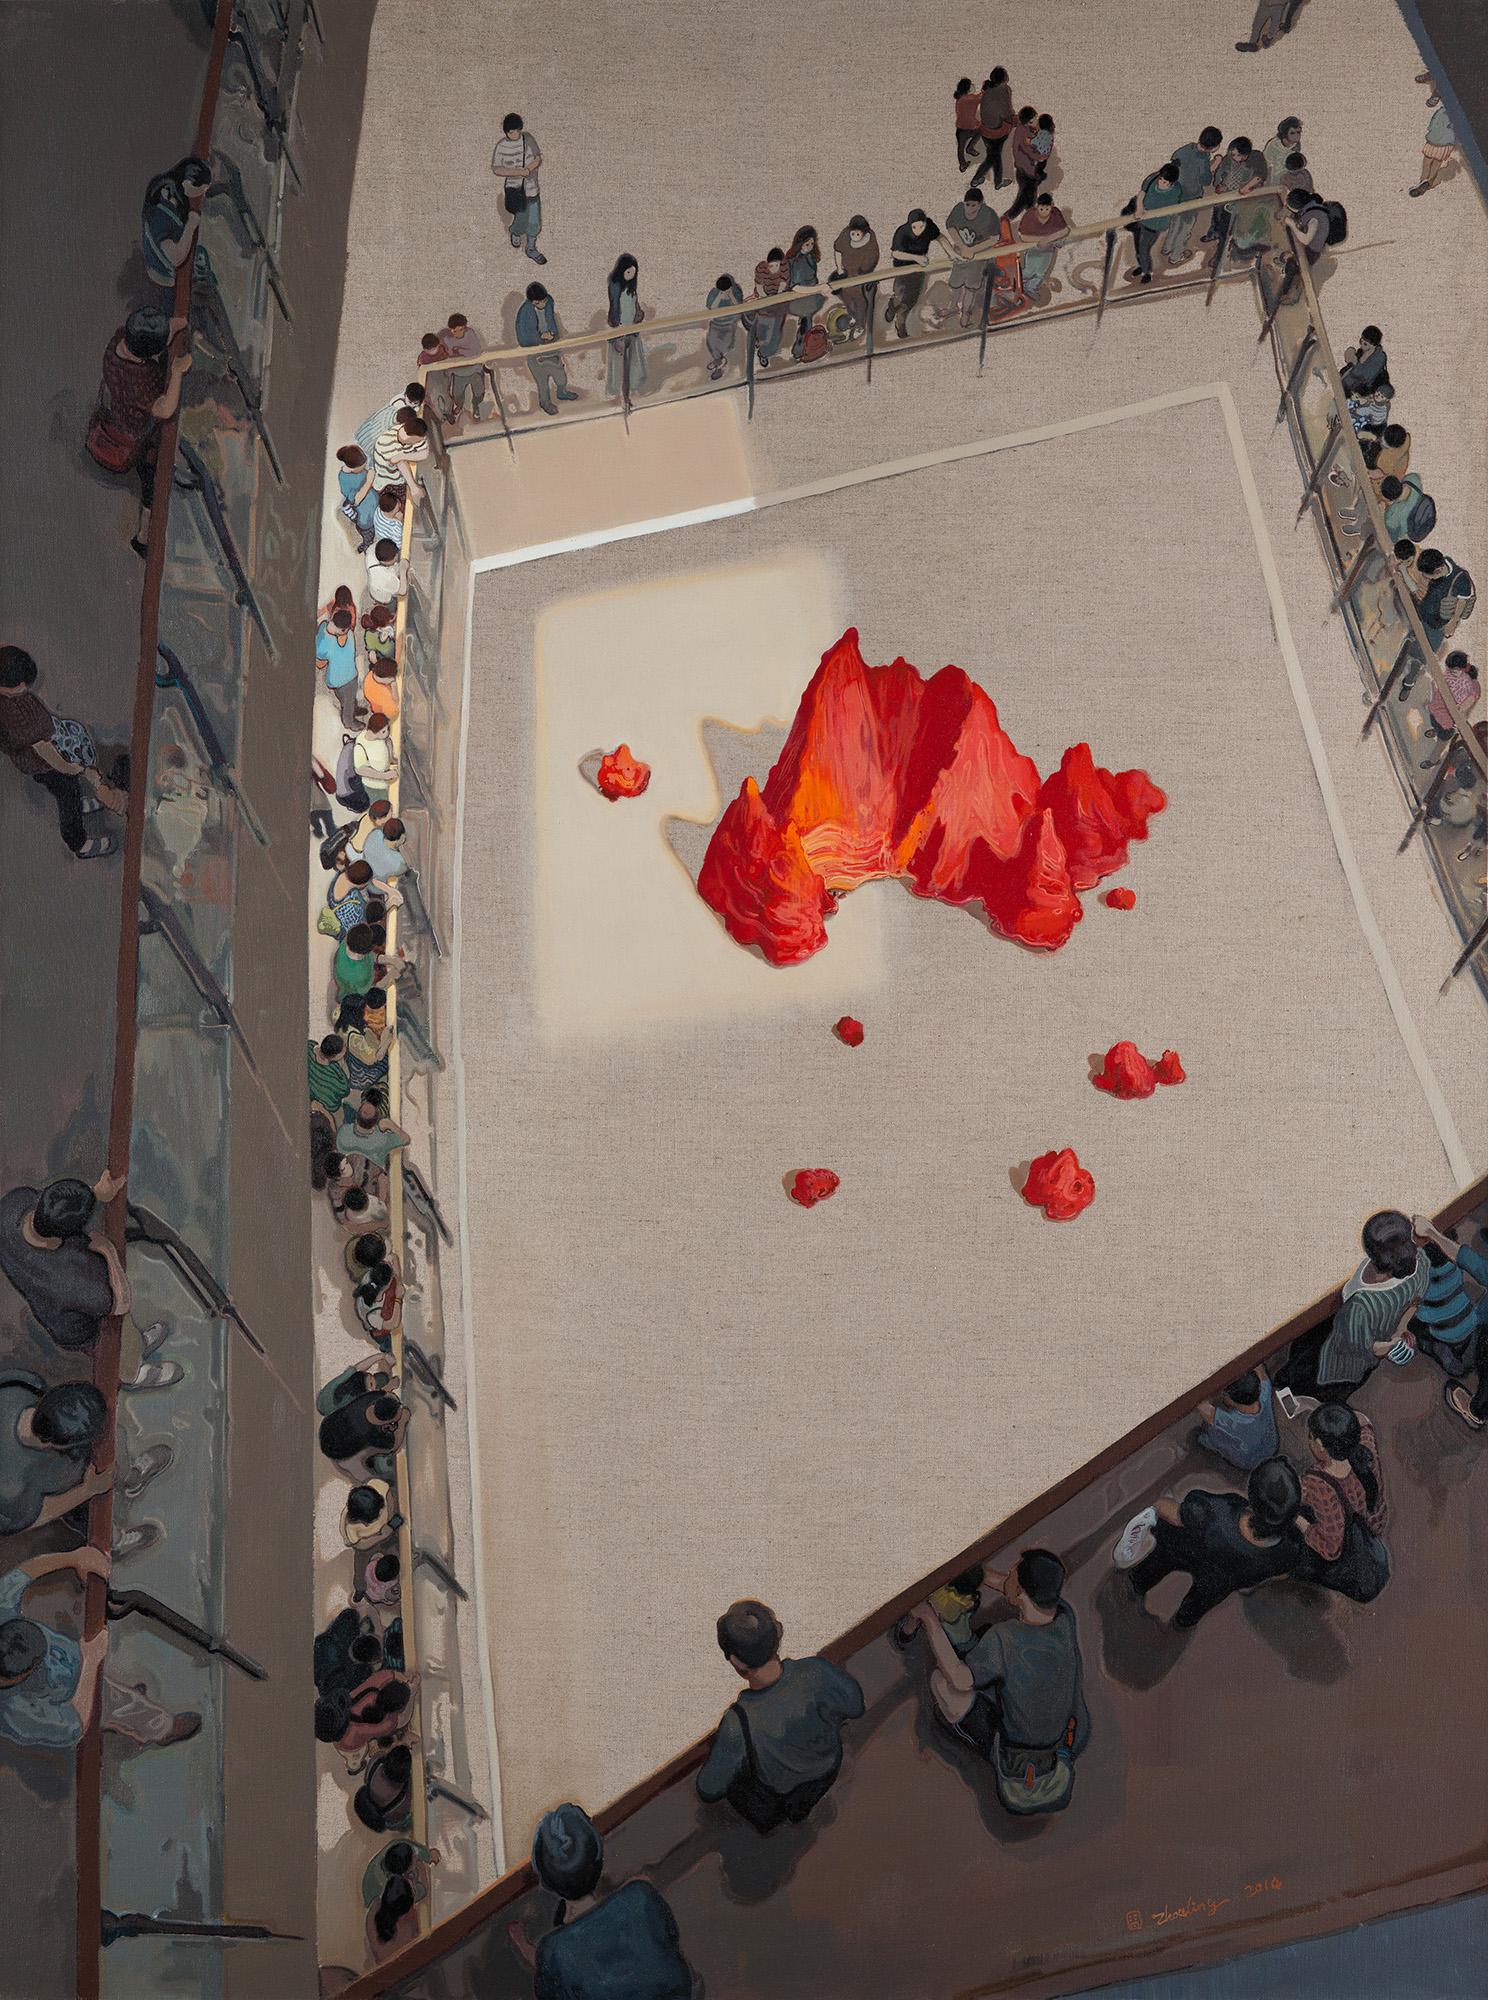 Zhou Jinhua 周金华, The Scenery of the City No.4 城市中的风景 No.4, 2014, Oil on Canvas 布面油画, 200 x 150 cm